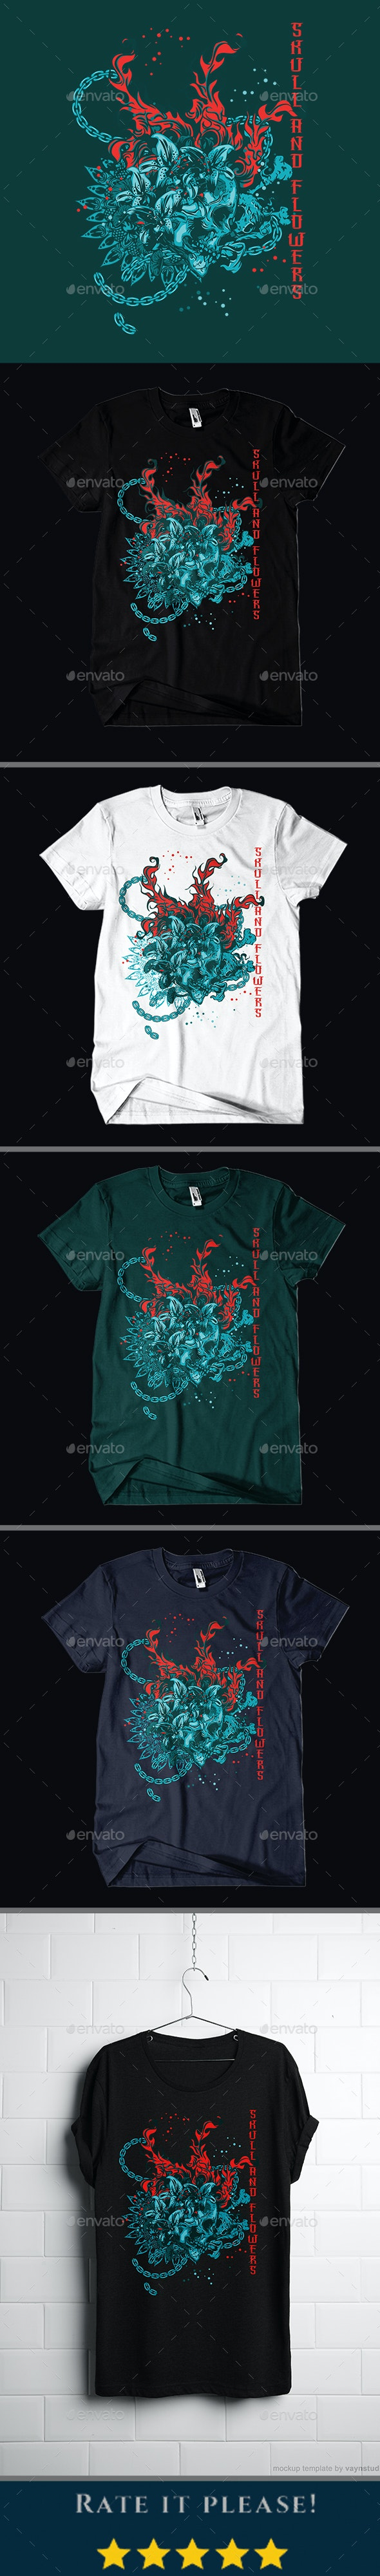 Skull And Flowers T-shirt Design - Grunge Designs